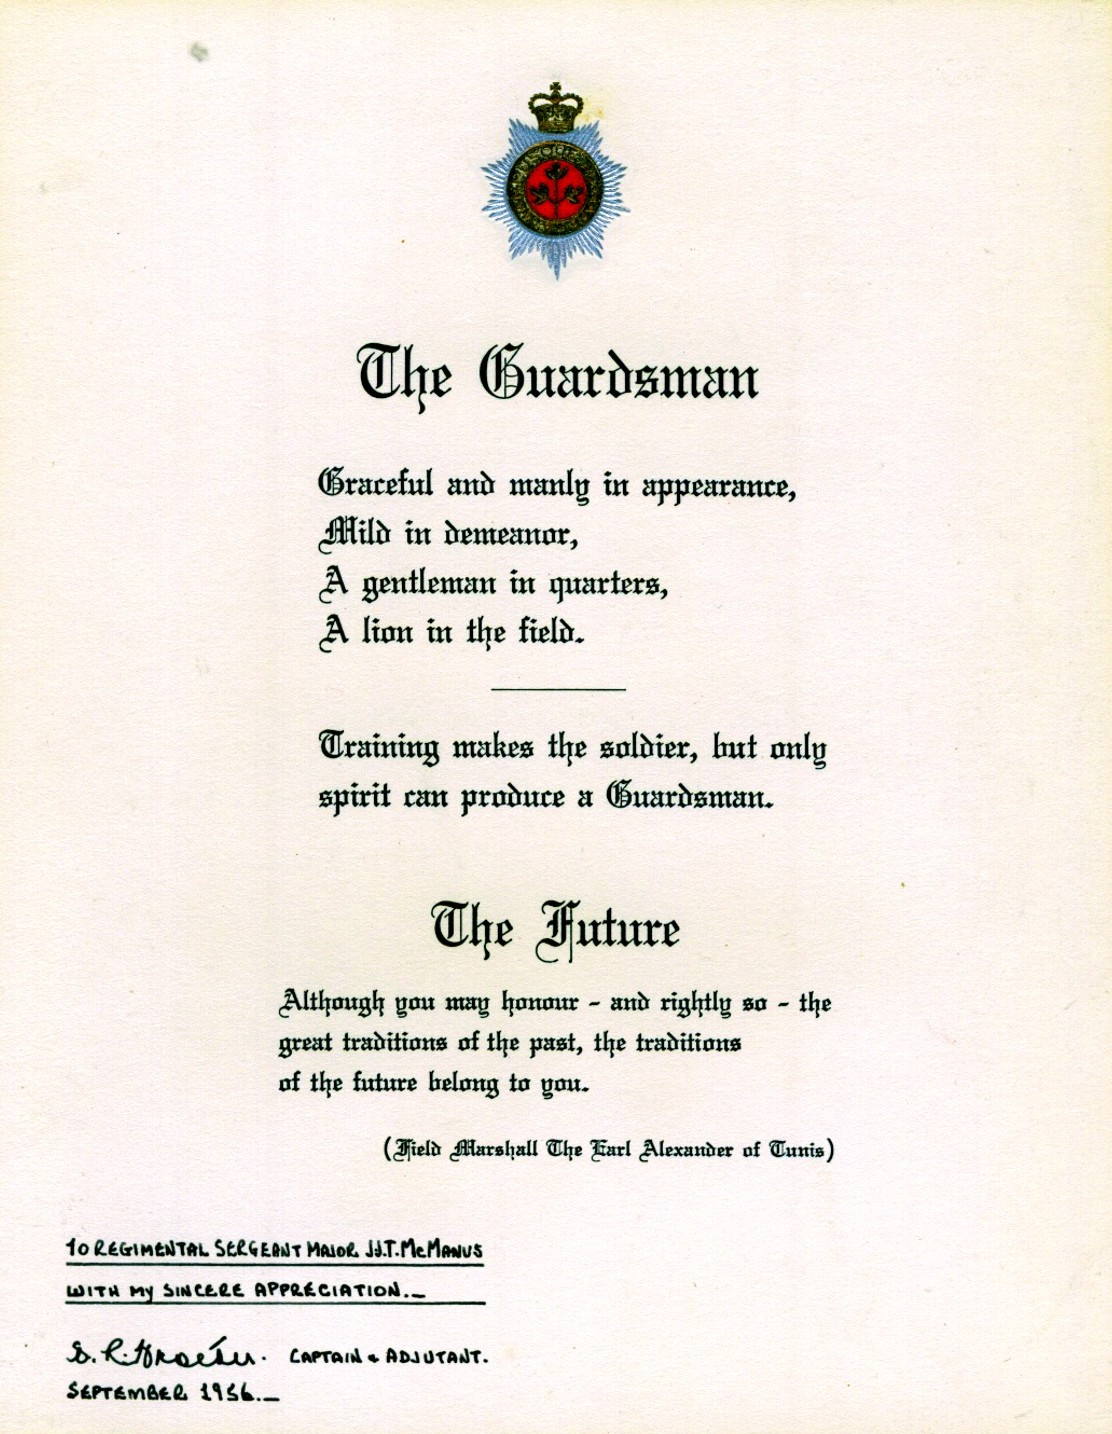 0_The Guardsman